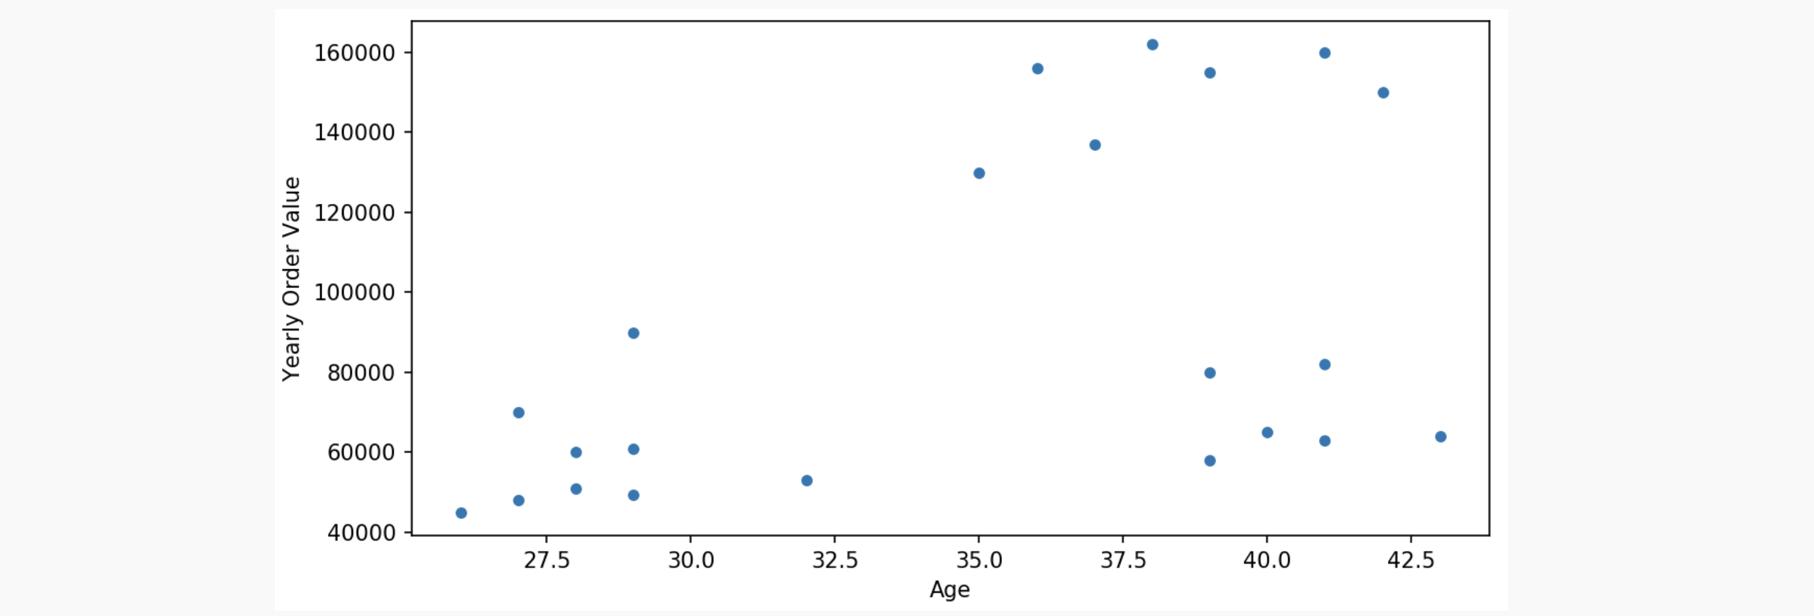 Scatterplot customer segmentation